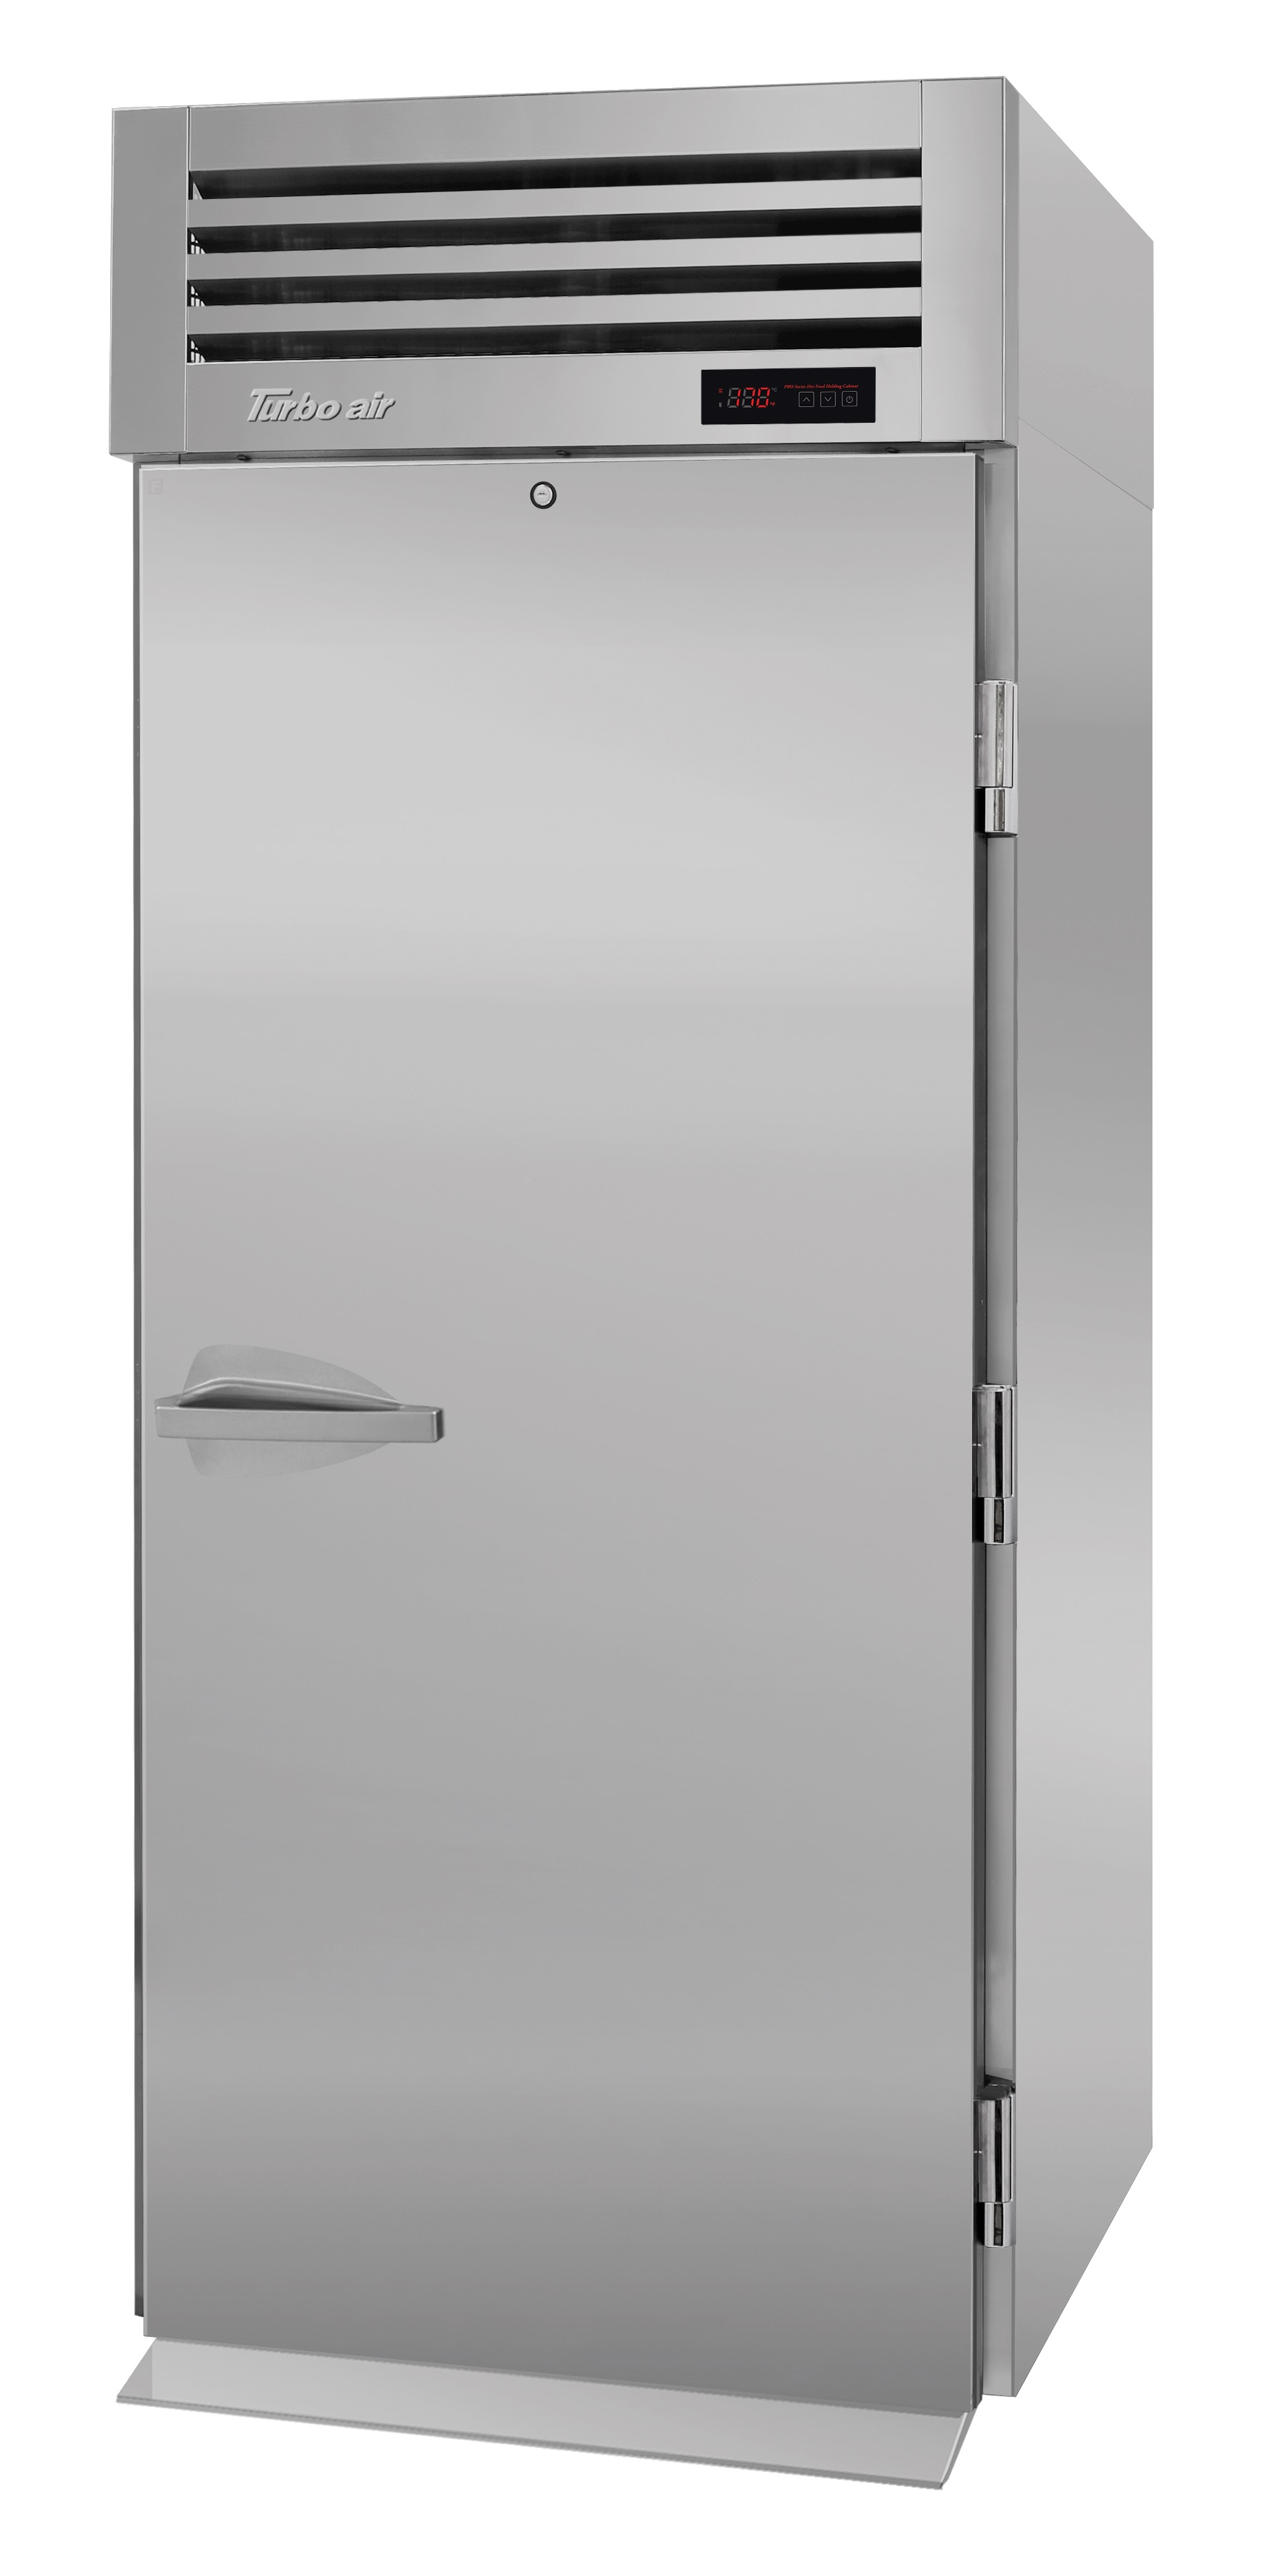 Turbo Air PRO-26H-RI pro series - reach in refrigerator